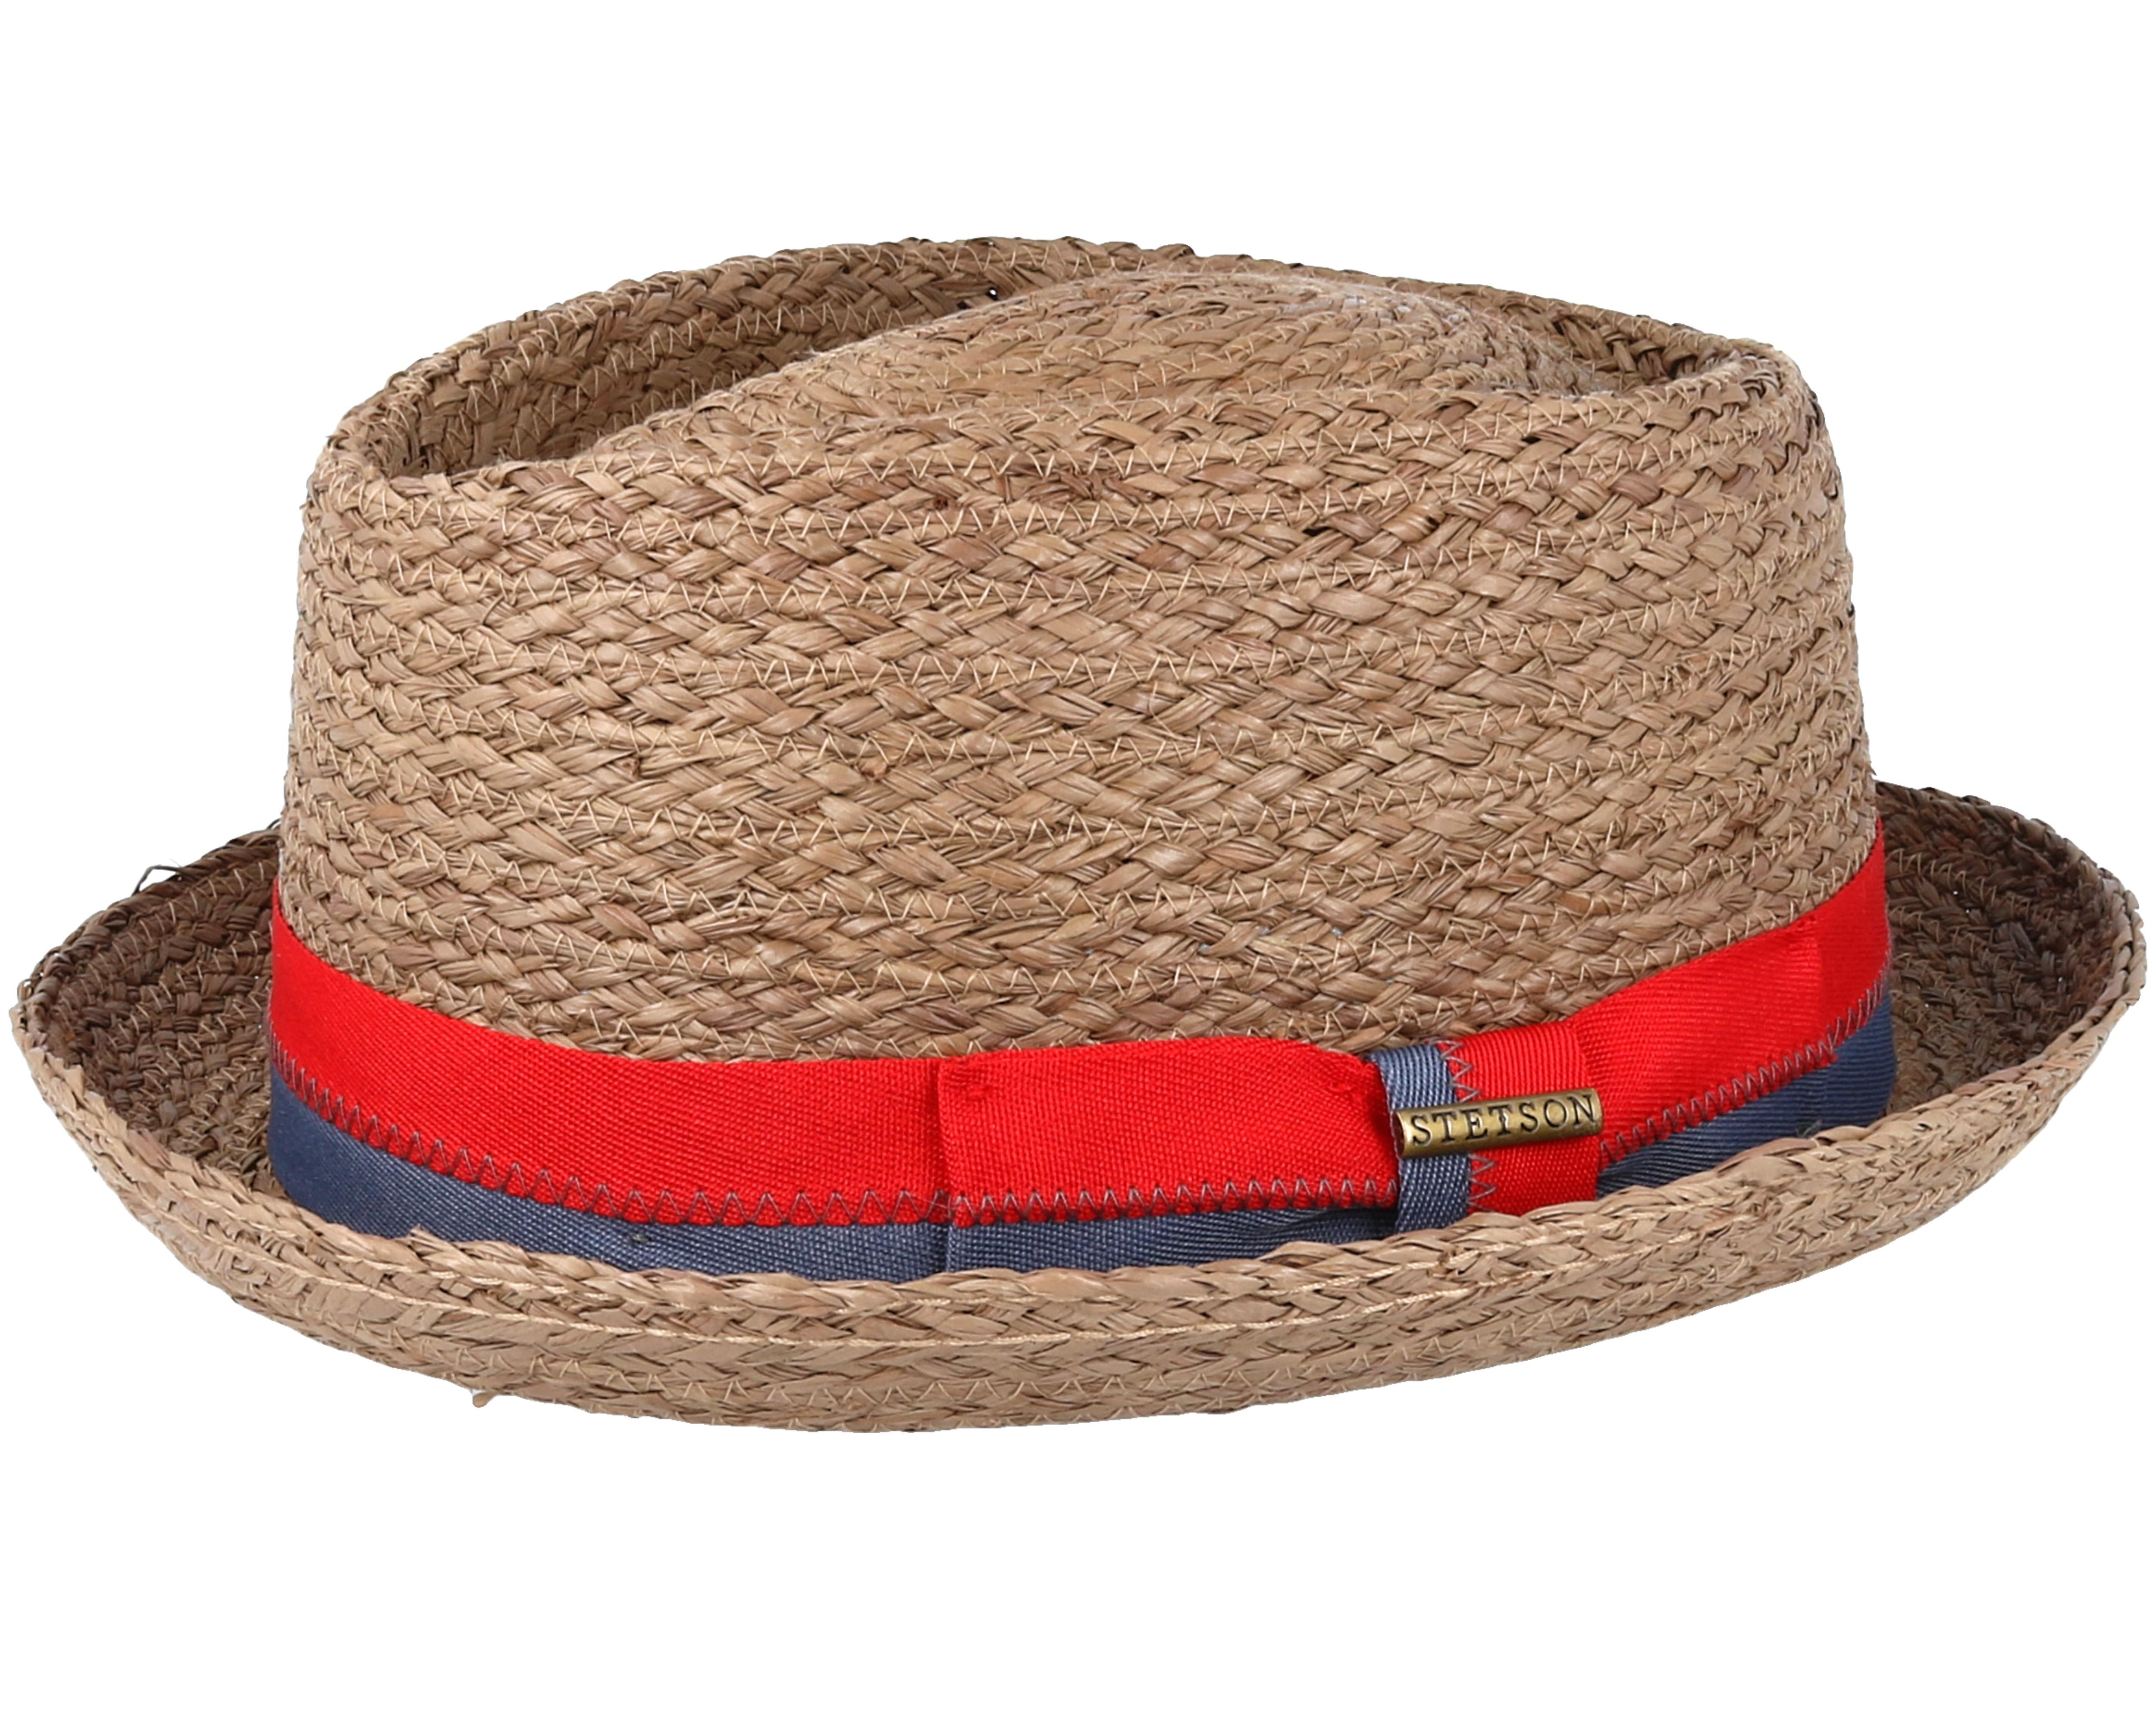 cd540d81aef Diamond Raffia Braun Straw - Stetson hats